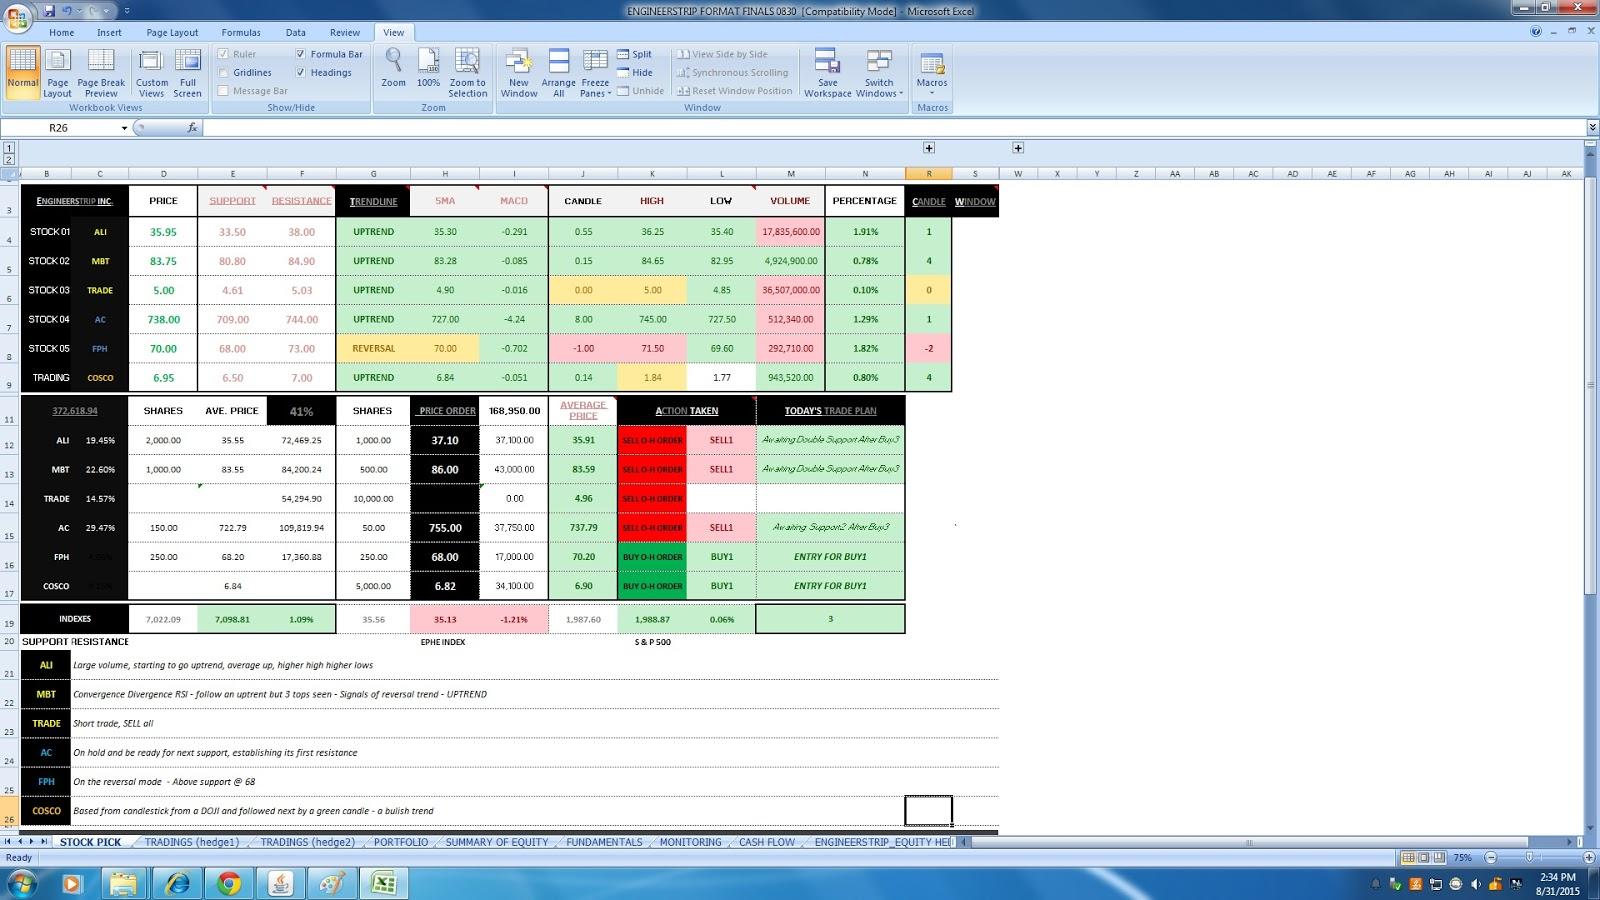 Philippine Stock Market Trading Online Diary